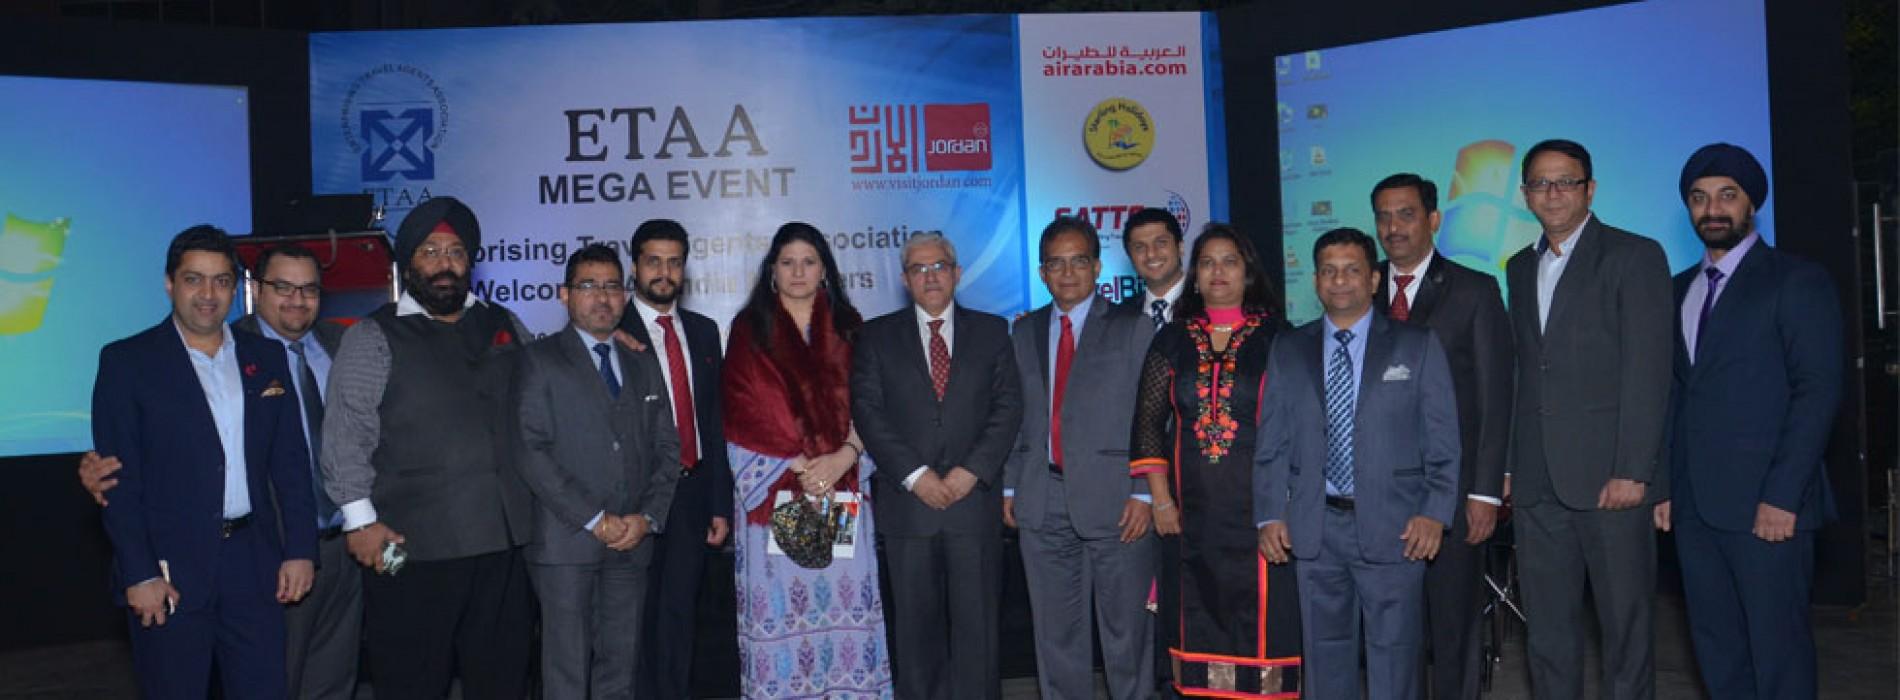 Jordan Tourism Board kicks off 2016 with the ETAA Mega Meet